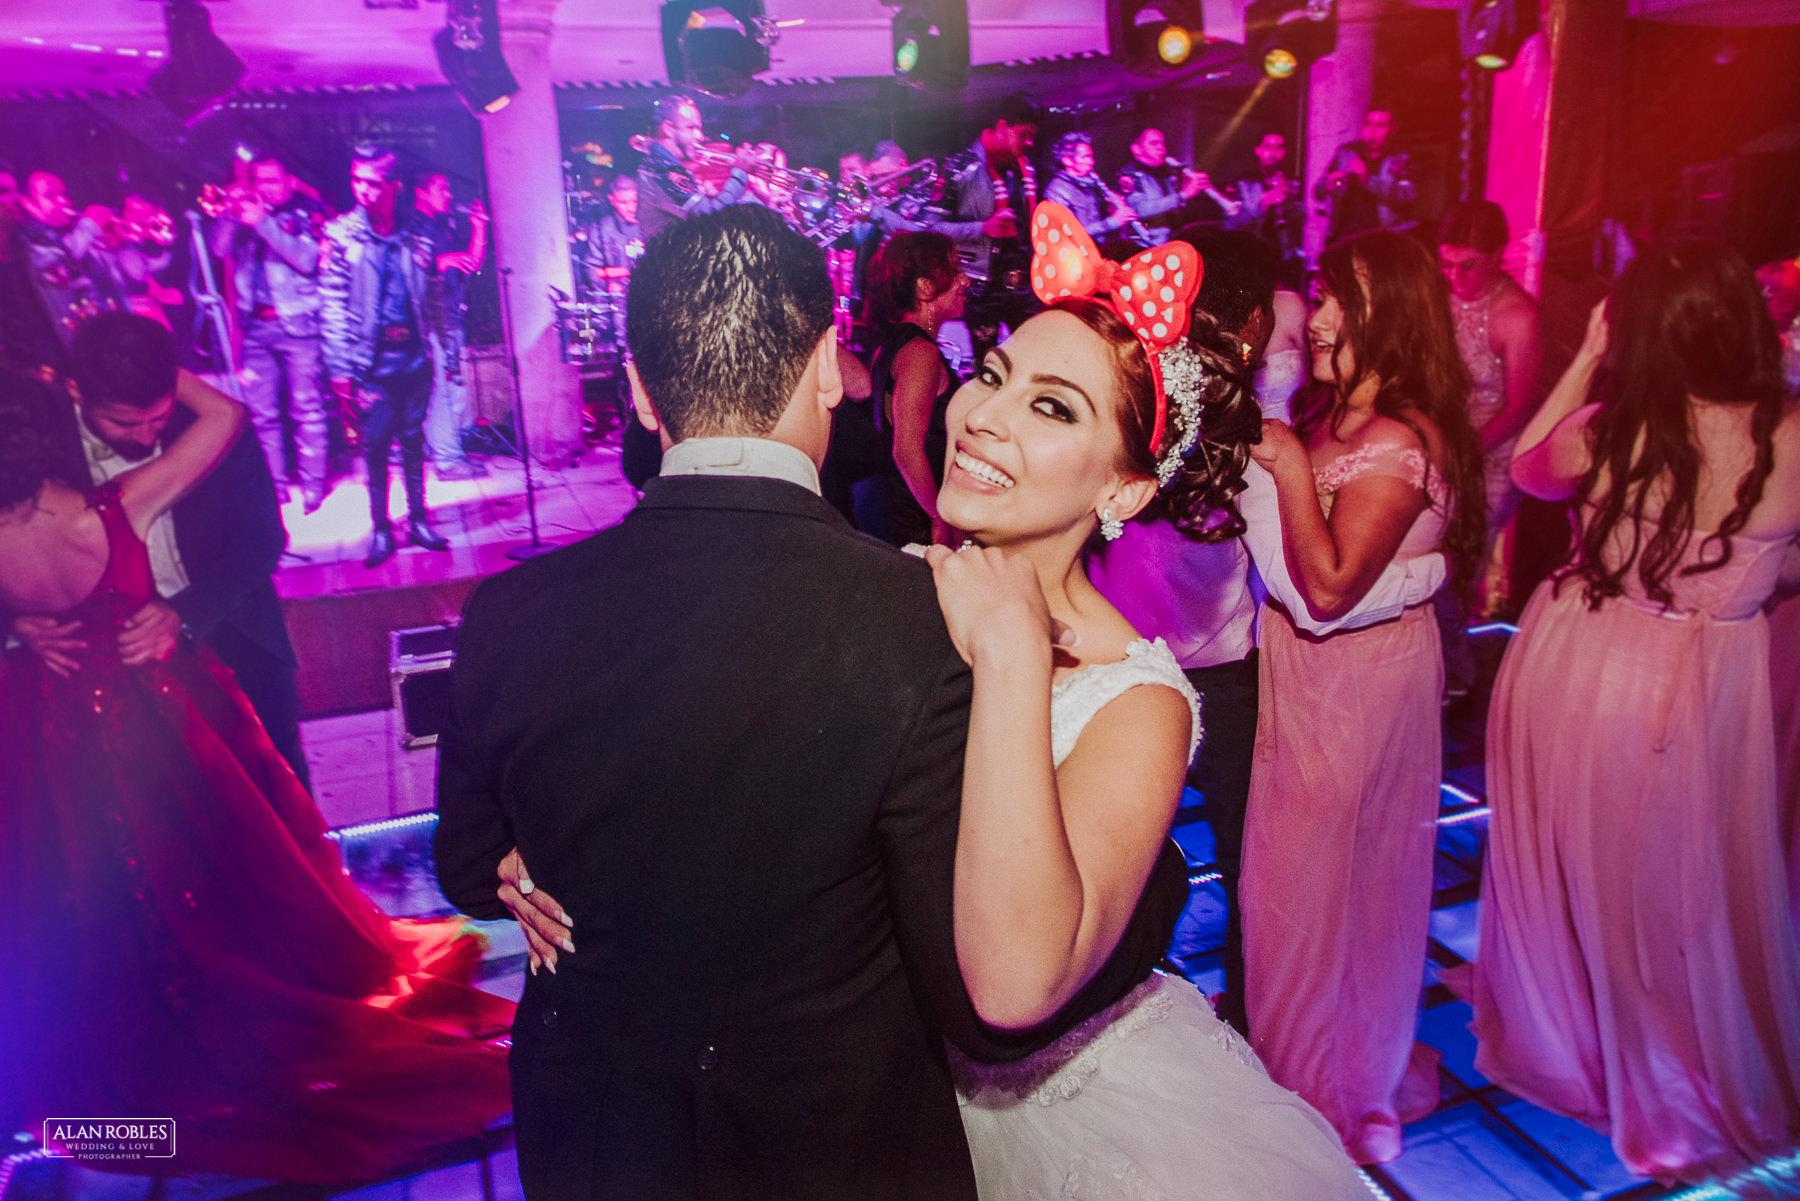 Alan Robles fotografo de bodas guadalajara - LyP Hotel Demetria-78